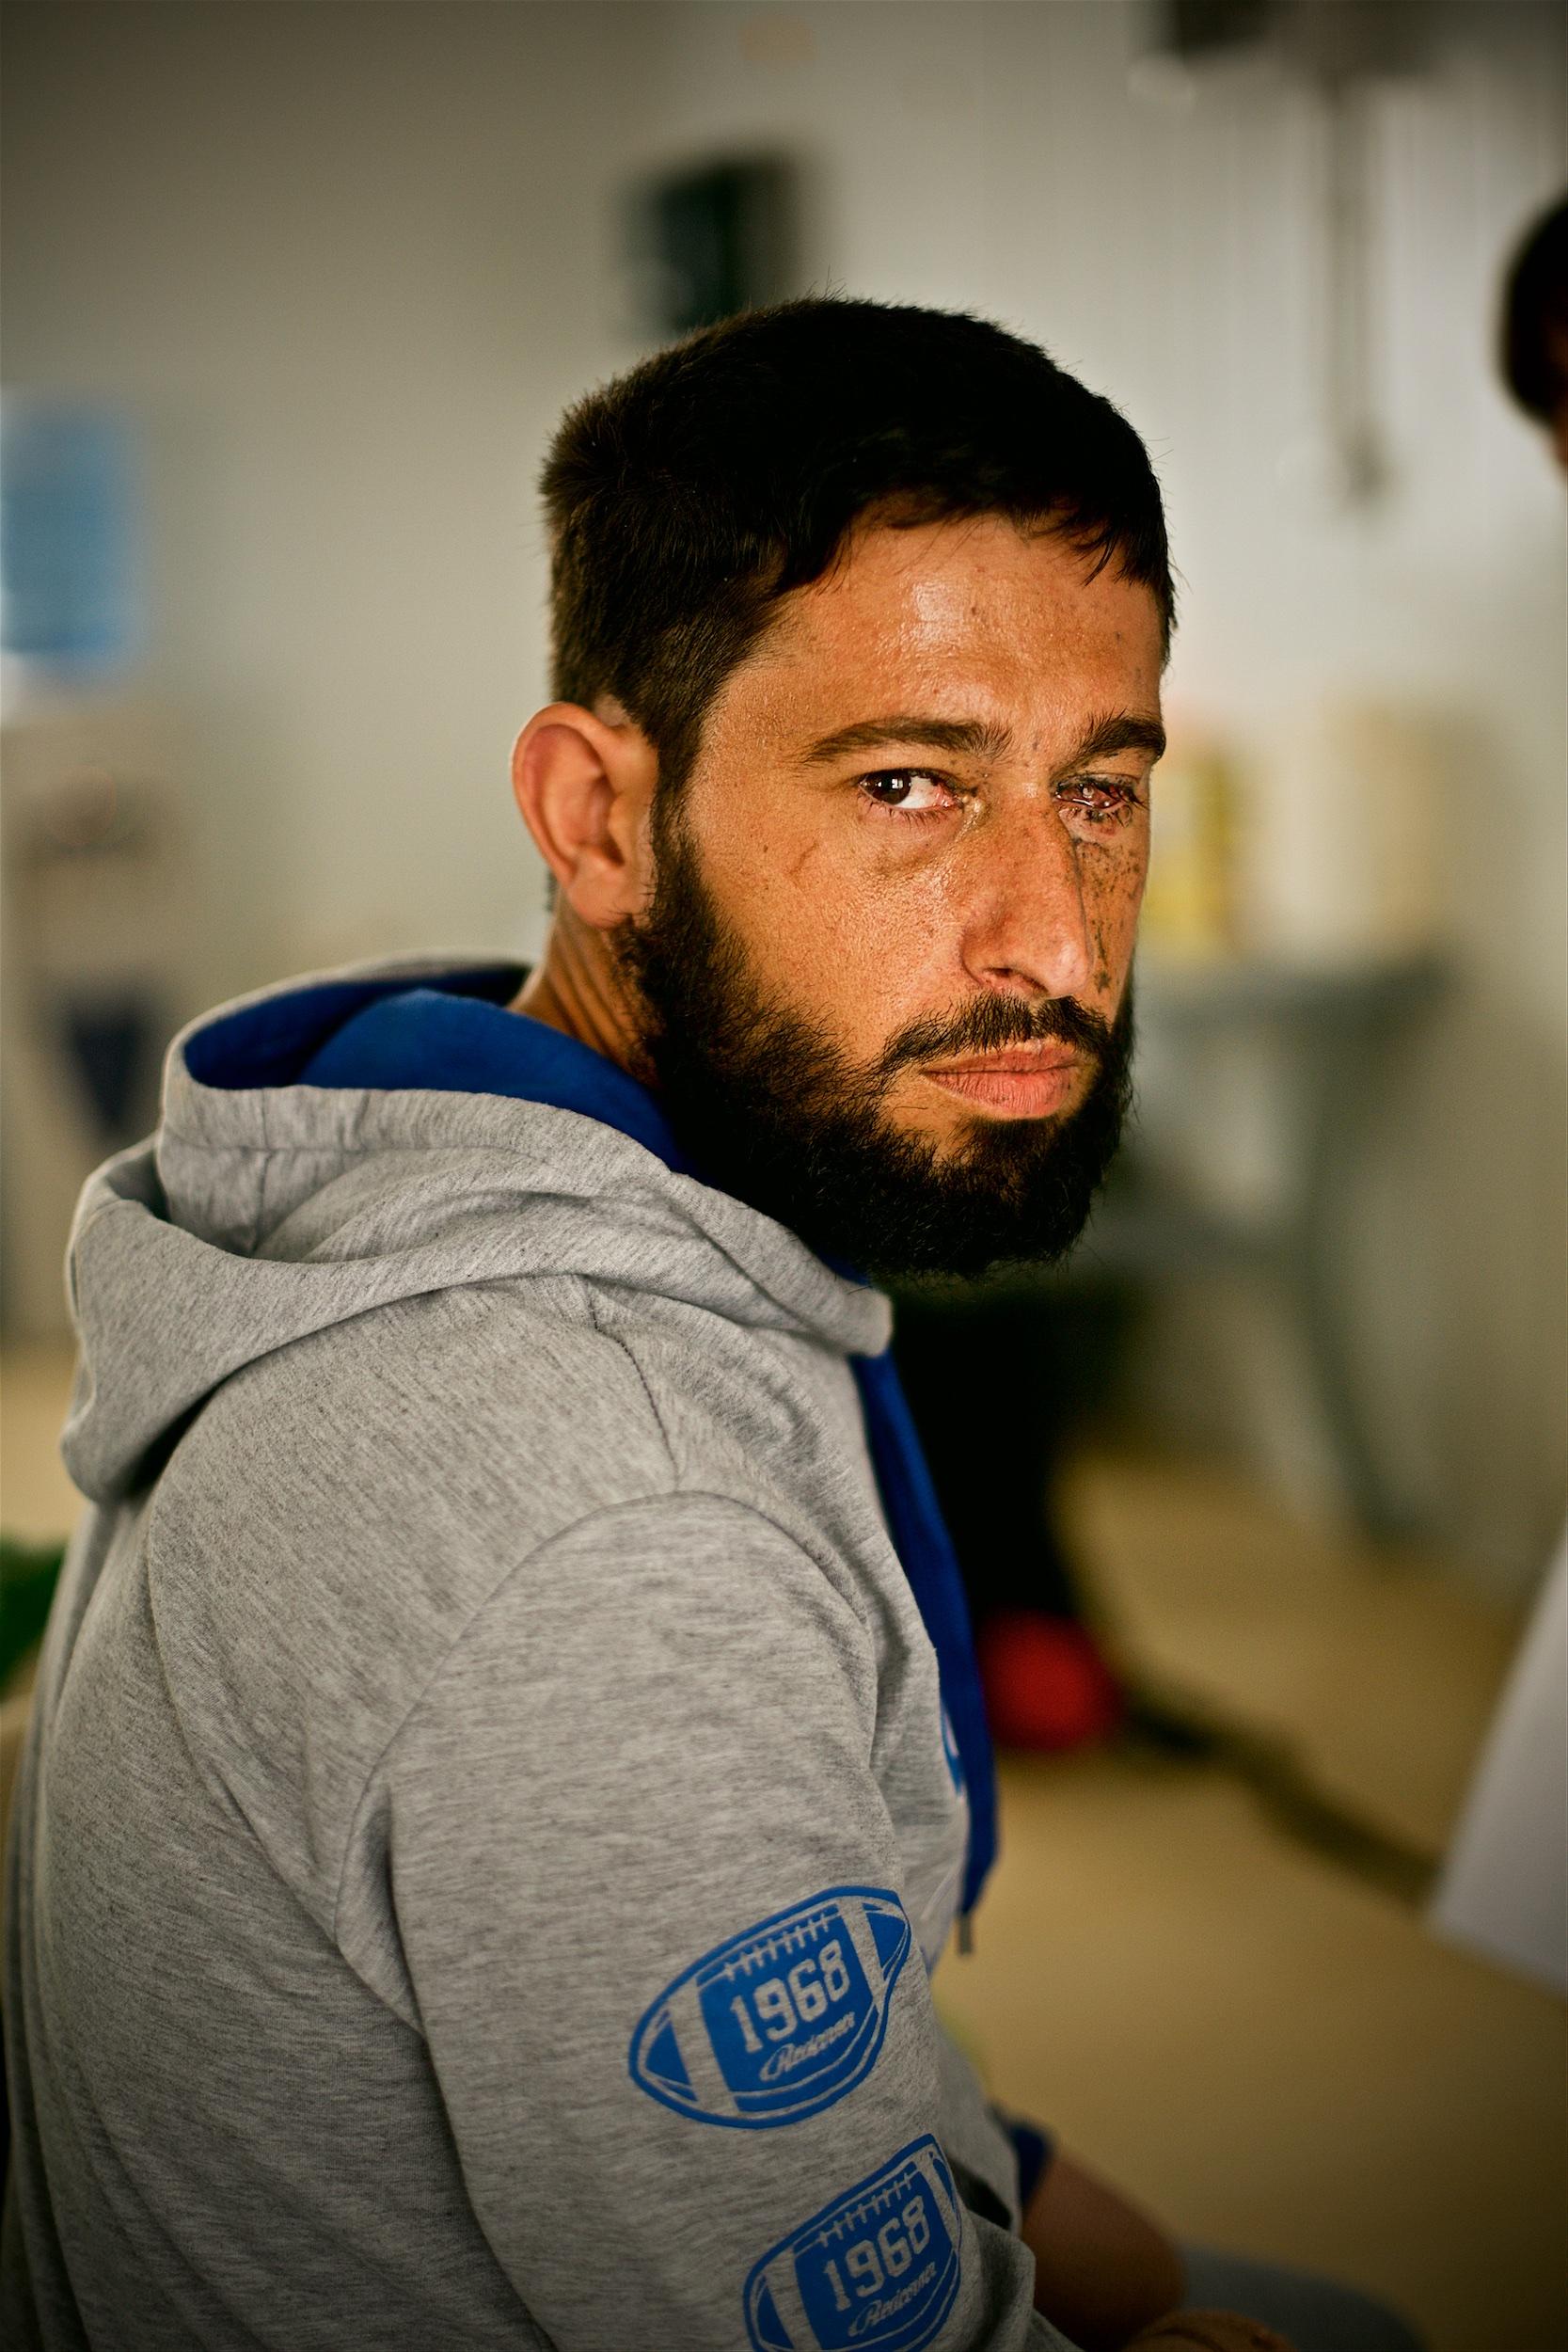 jordan-msf-zaatari-dectors-without-borders-war-hospital-refugee-camp-denis-bosnic-13.jpg